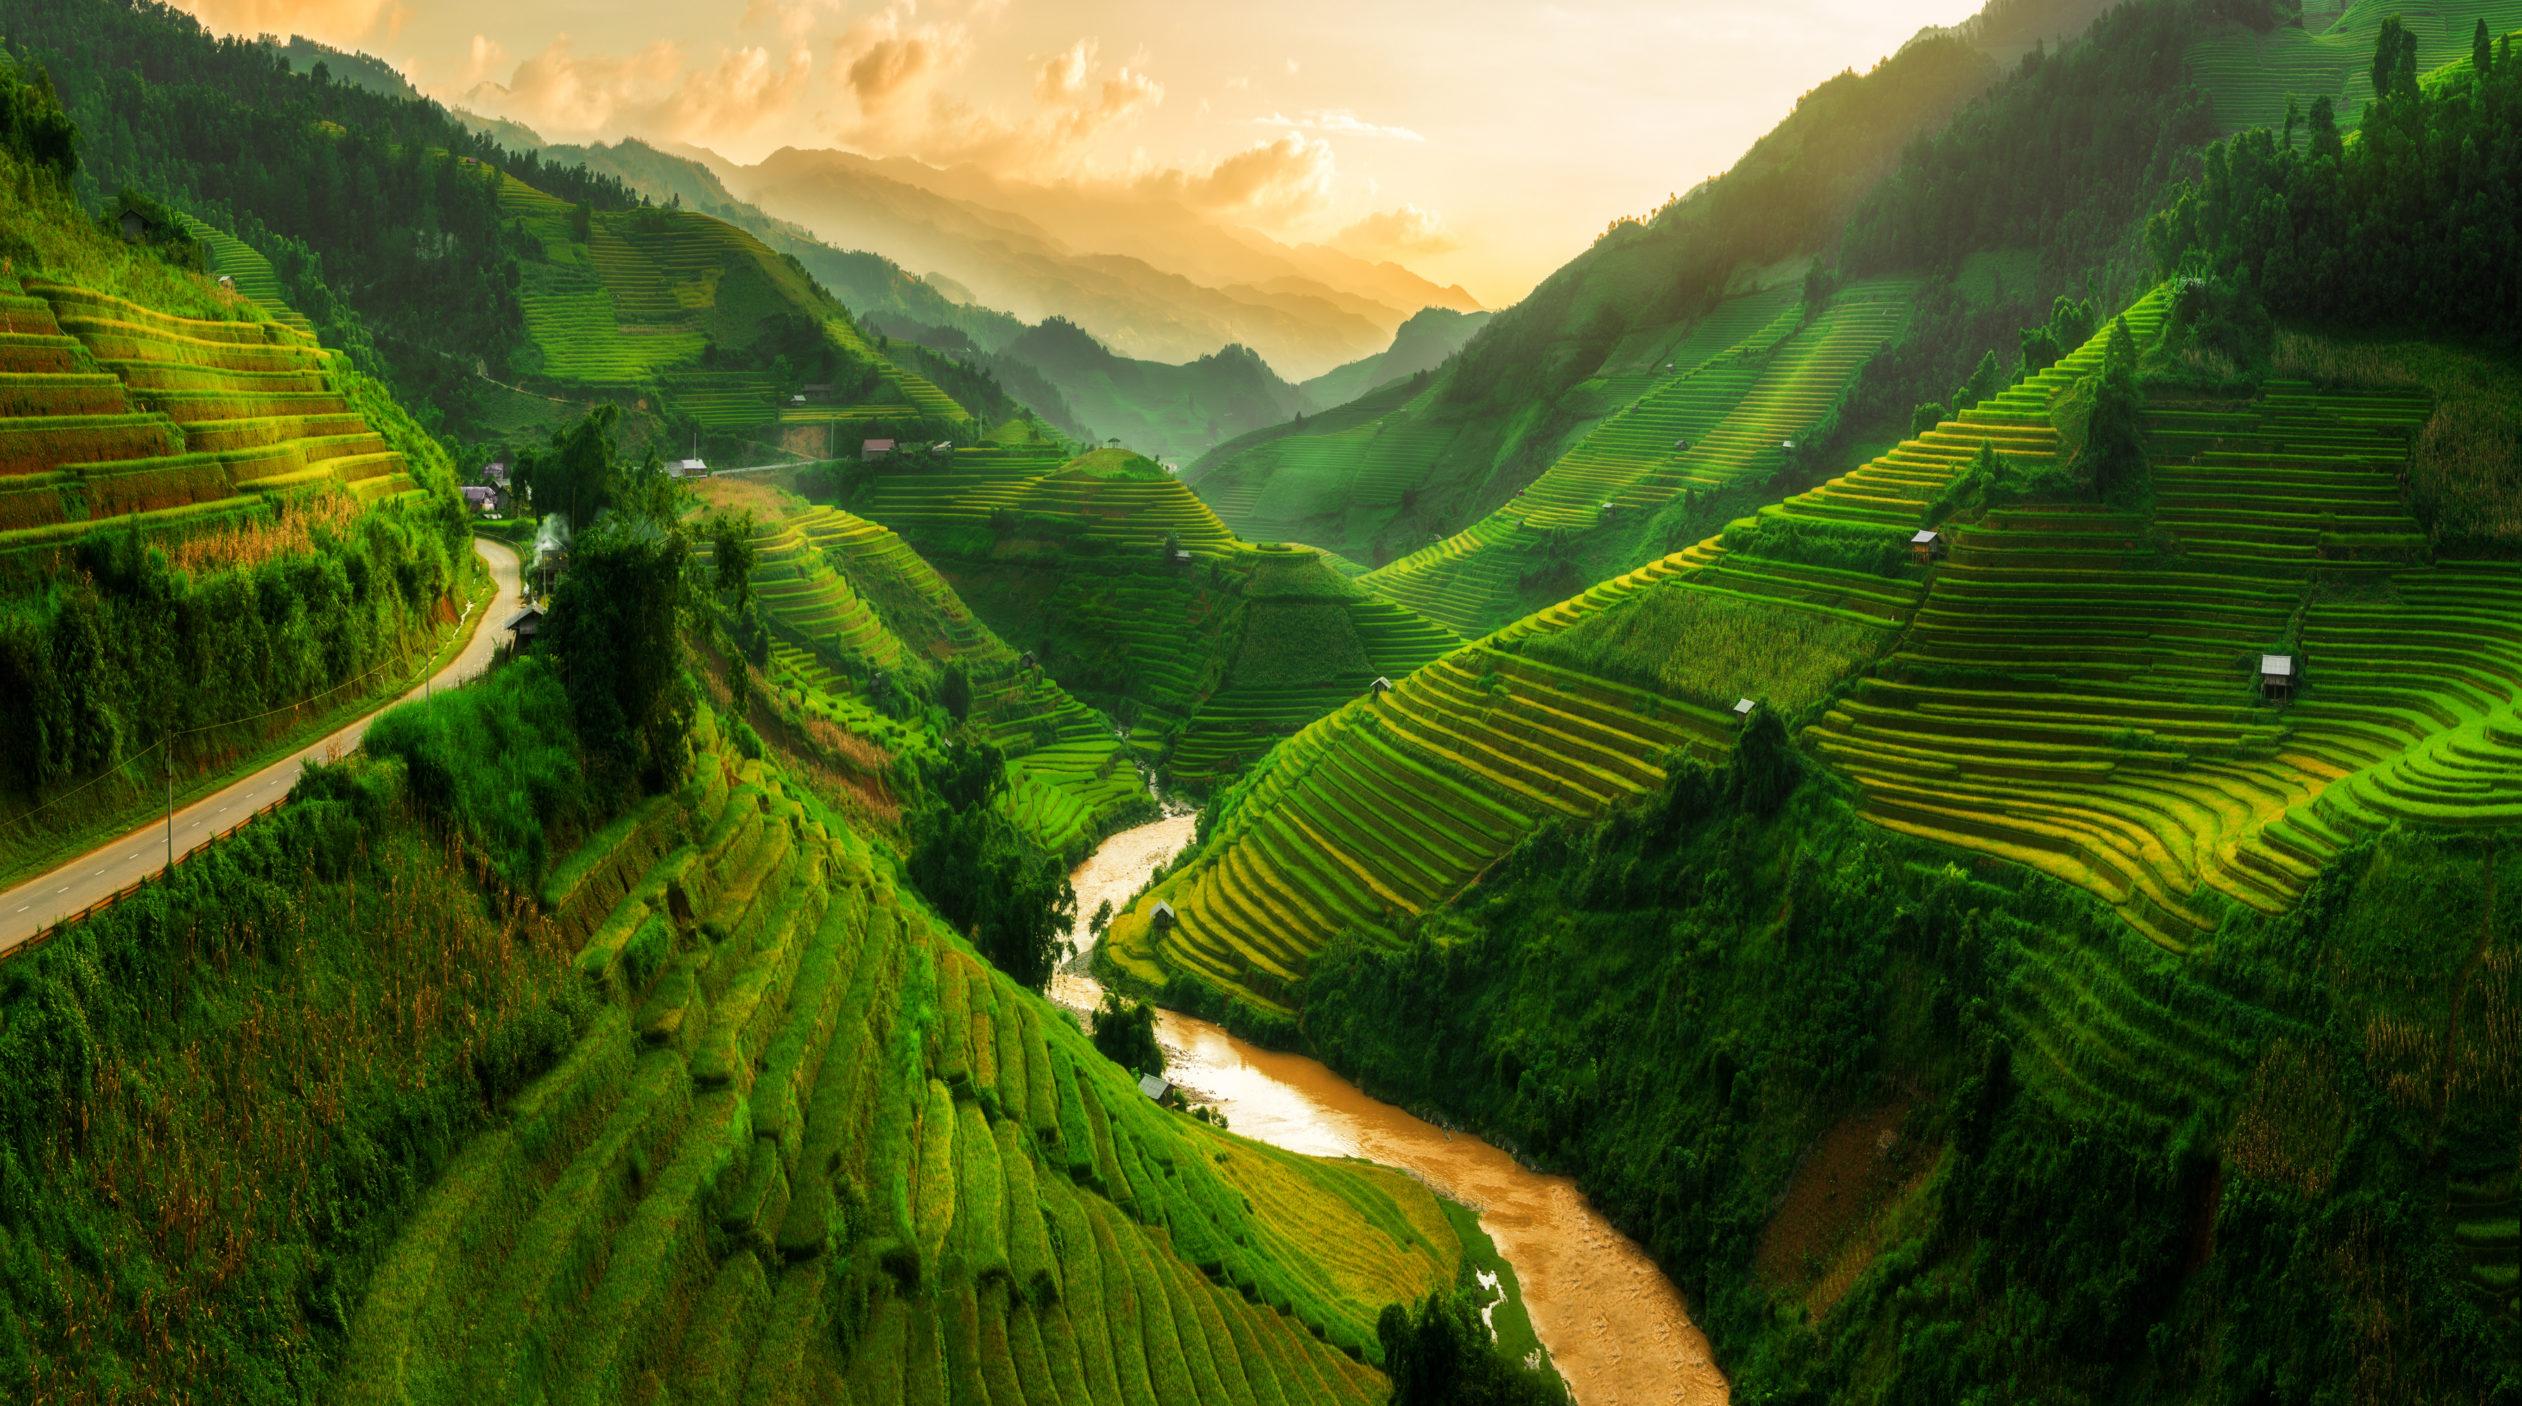 Vietnam [Shutterstock]